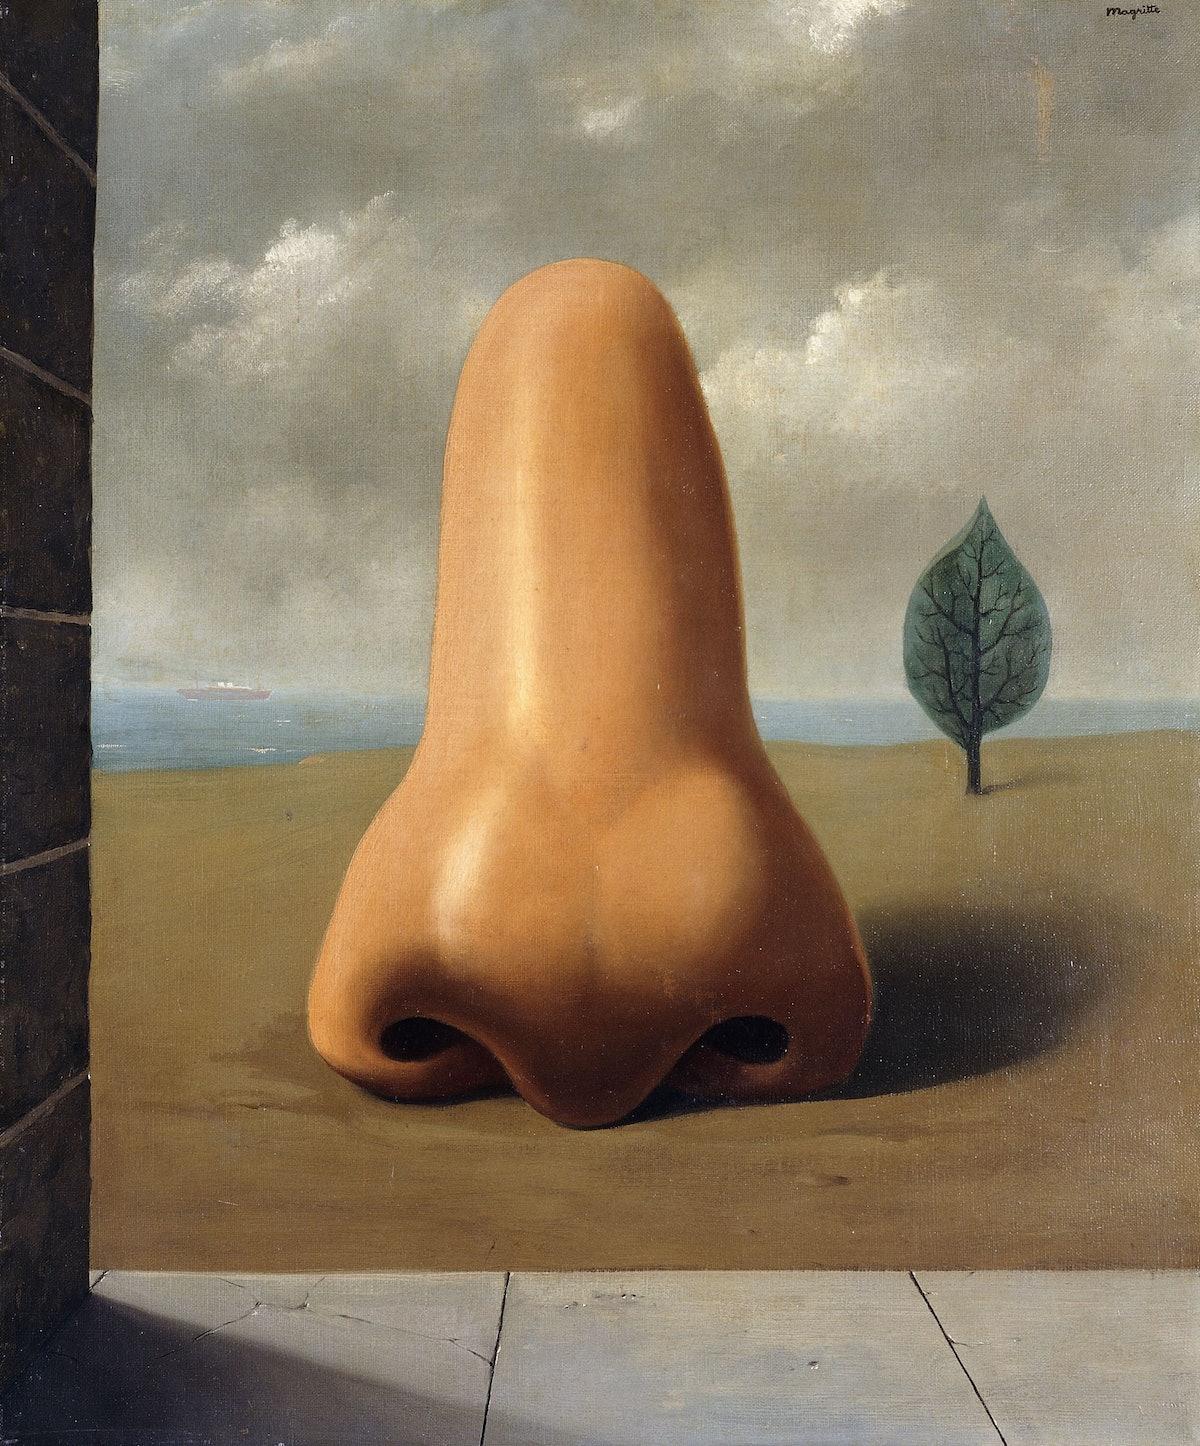 Rene Magritte's *La Bonne Aventure*, 1937. Courtesy of Artist Rights Group.